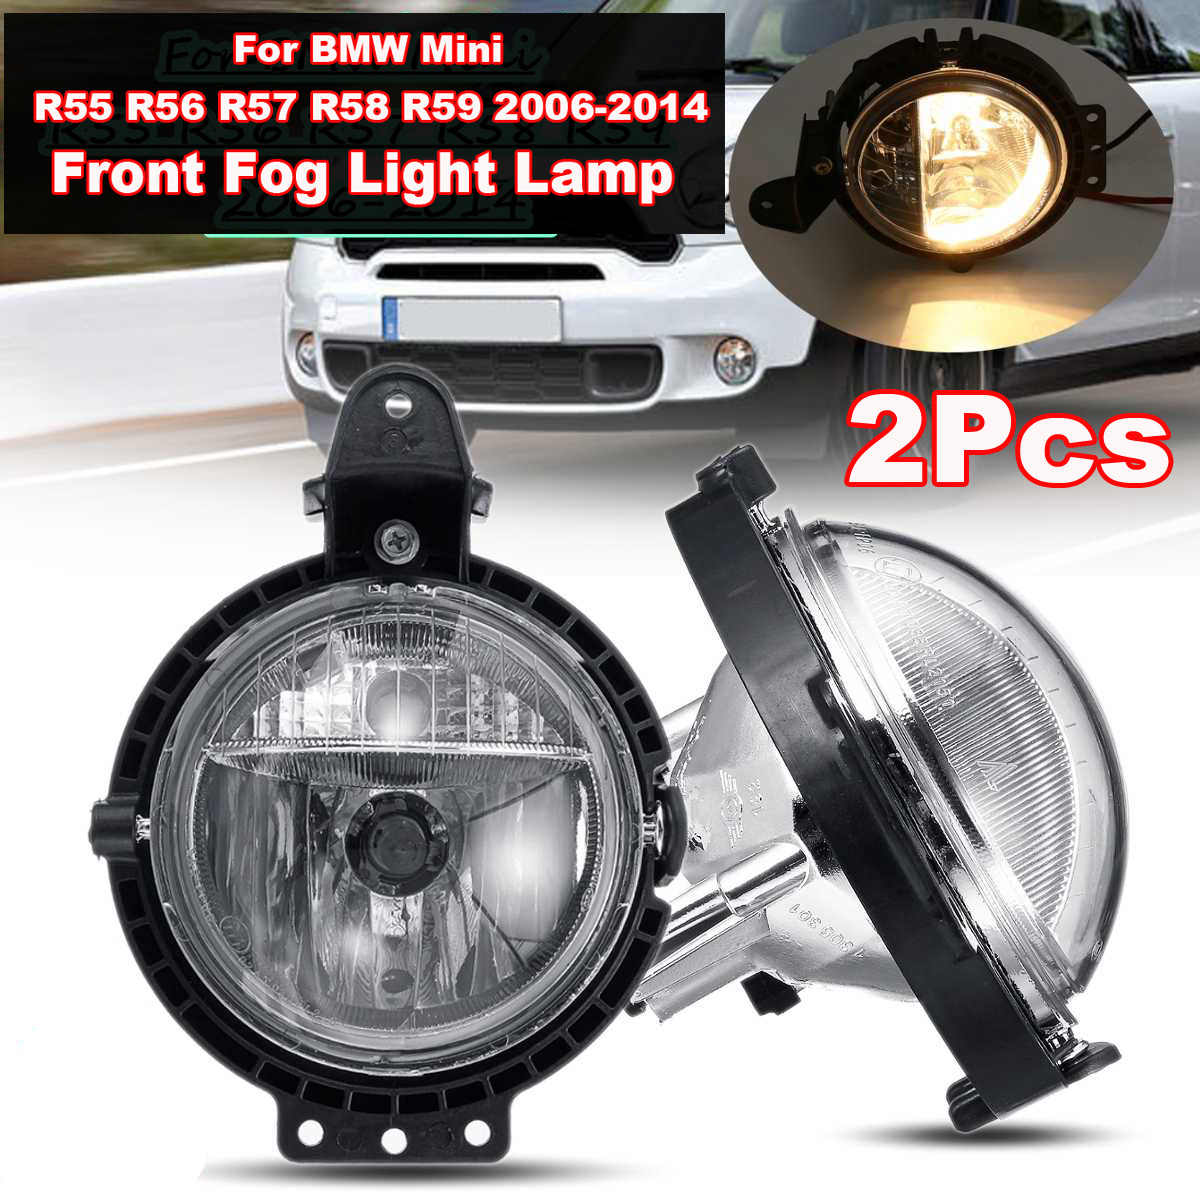 Paire de phares antibrouillard avant pour BMW MINI COOPER R55 R56 R57 R59 2006-2014